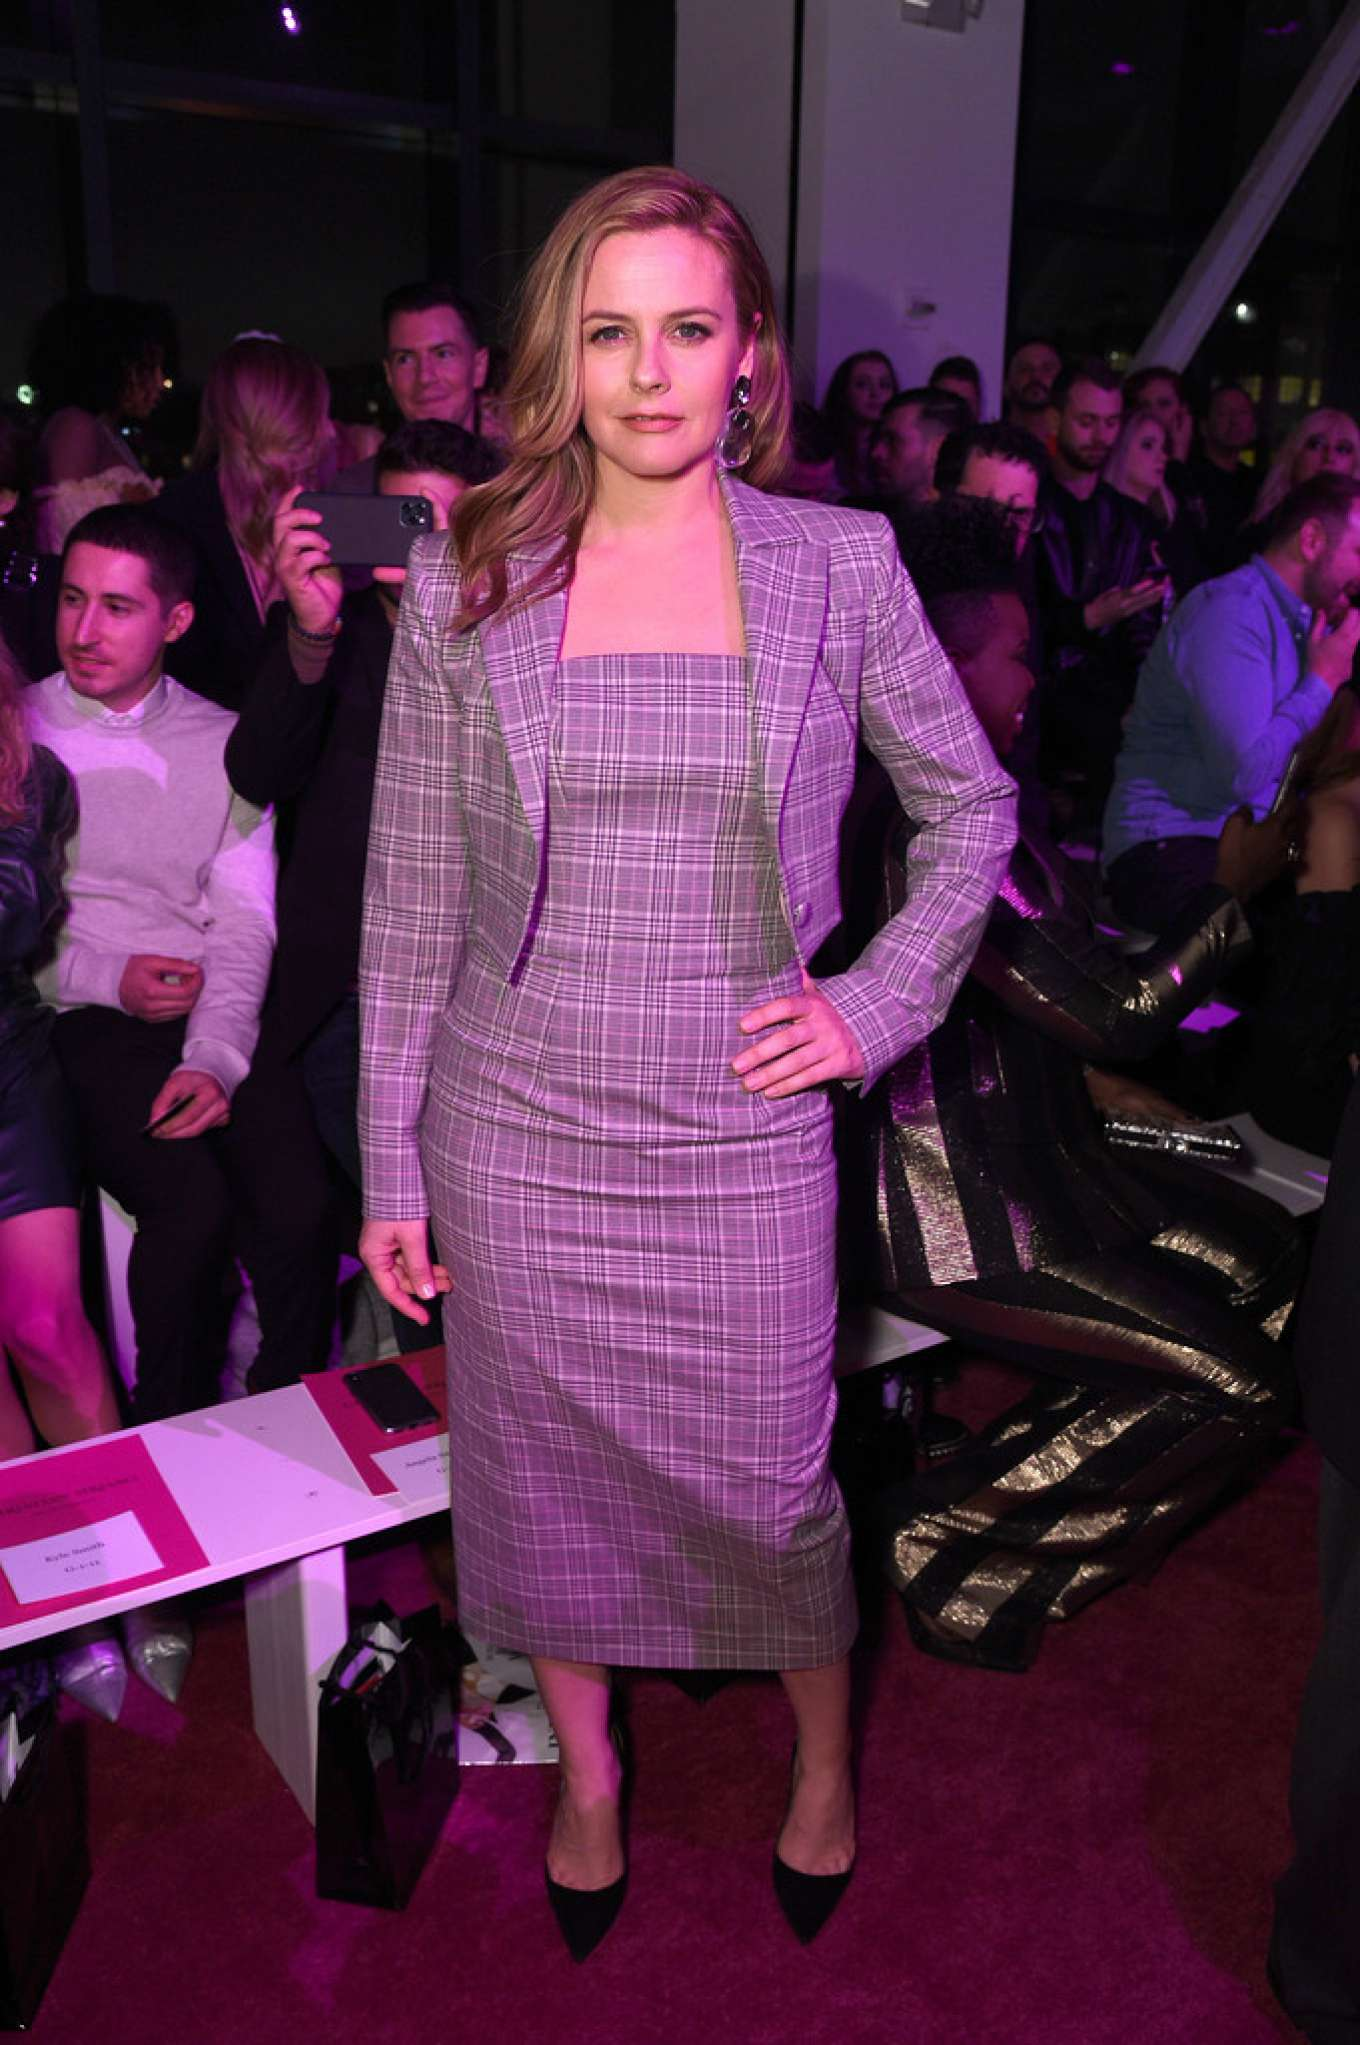 Alicia Silverstone 2020 : Alicia Silverstone – Christian Siriano Show at New York Fashion Week 2020-07